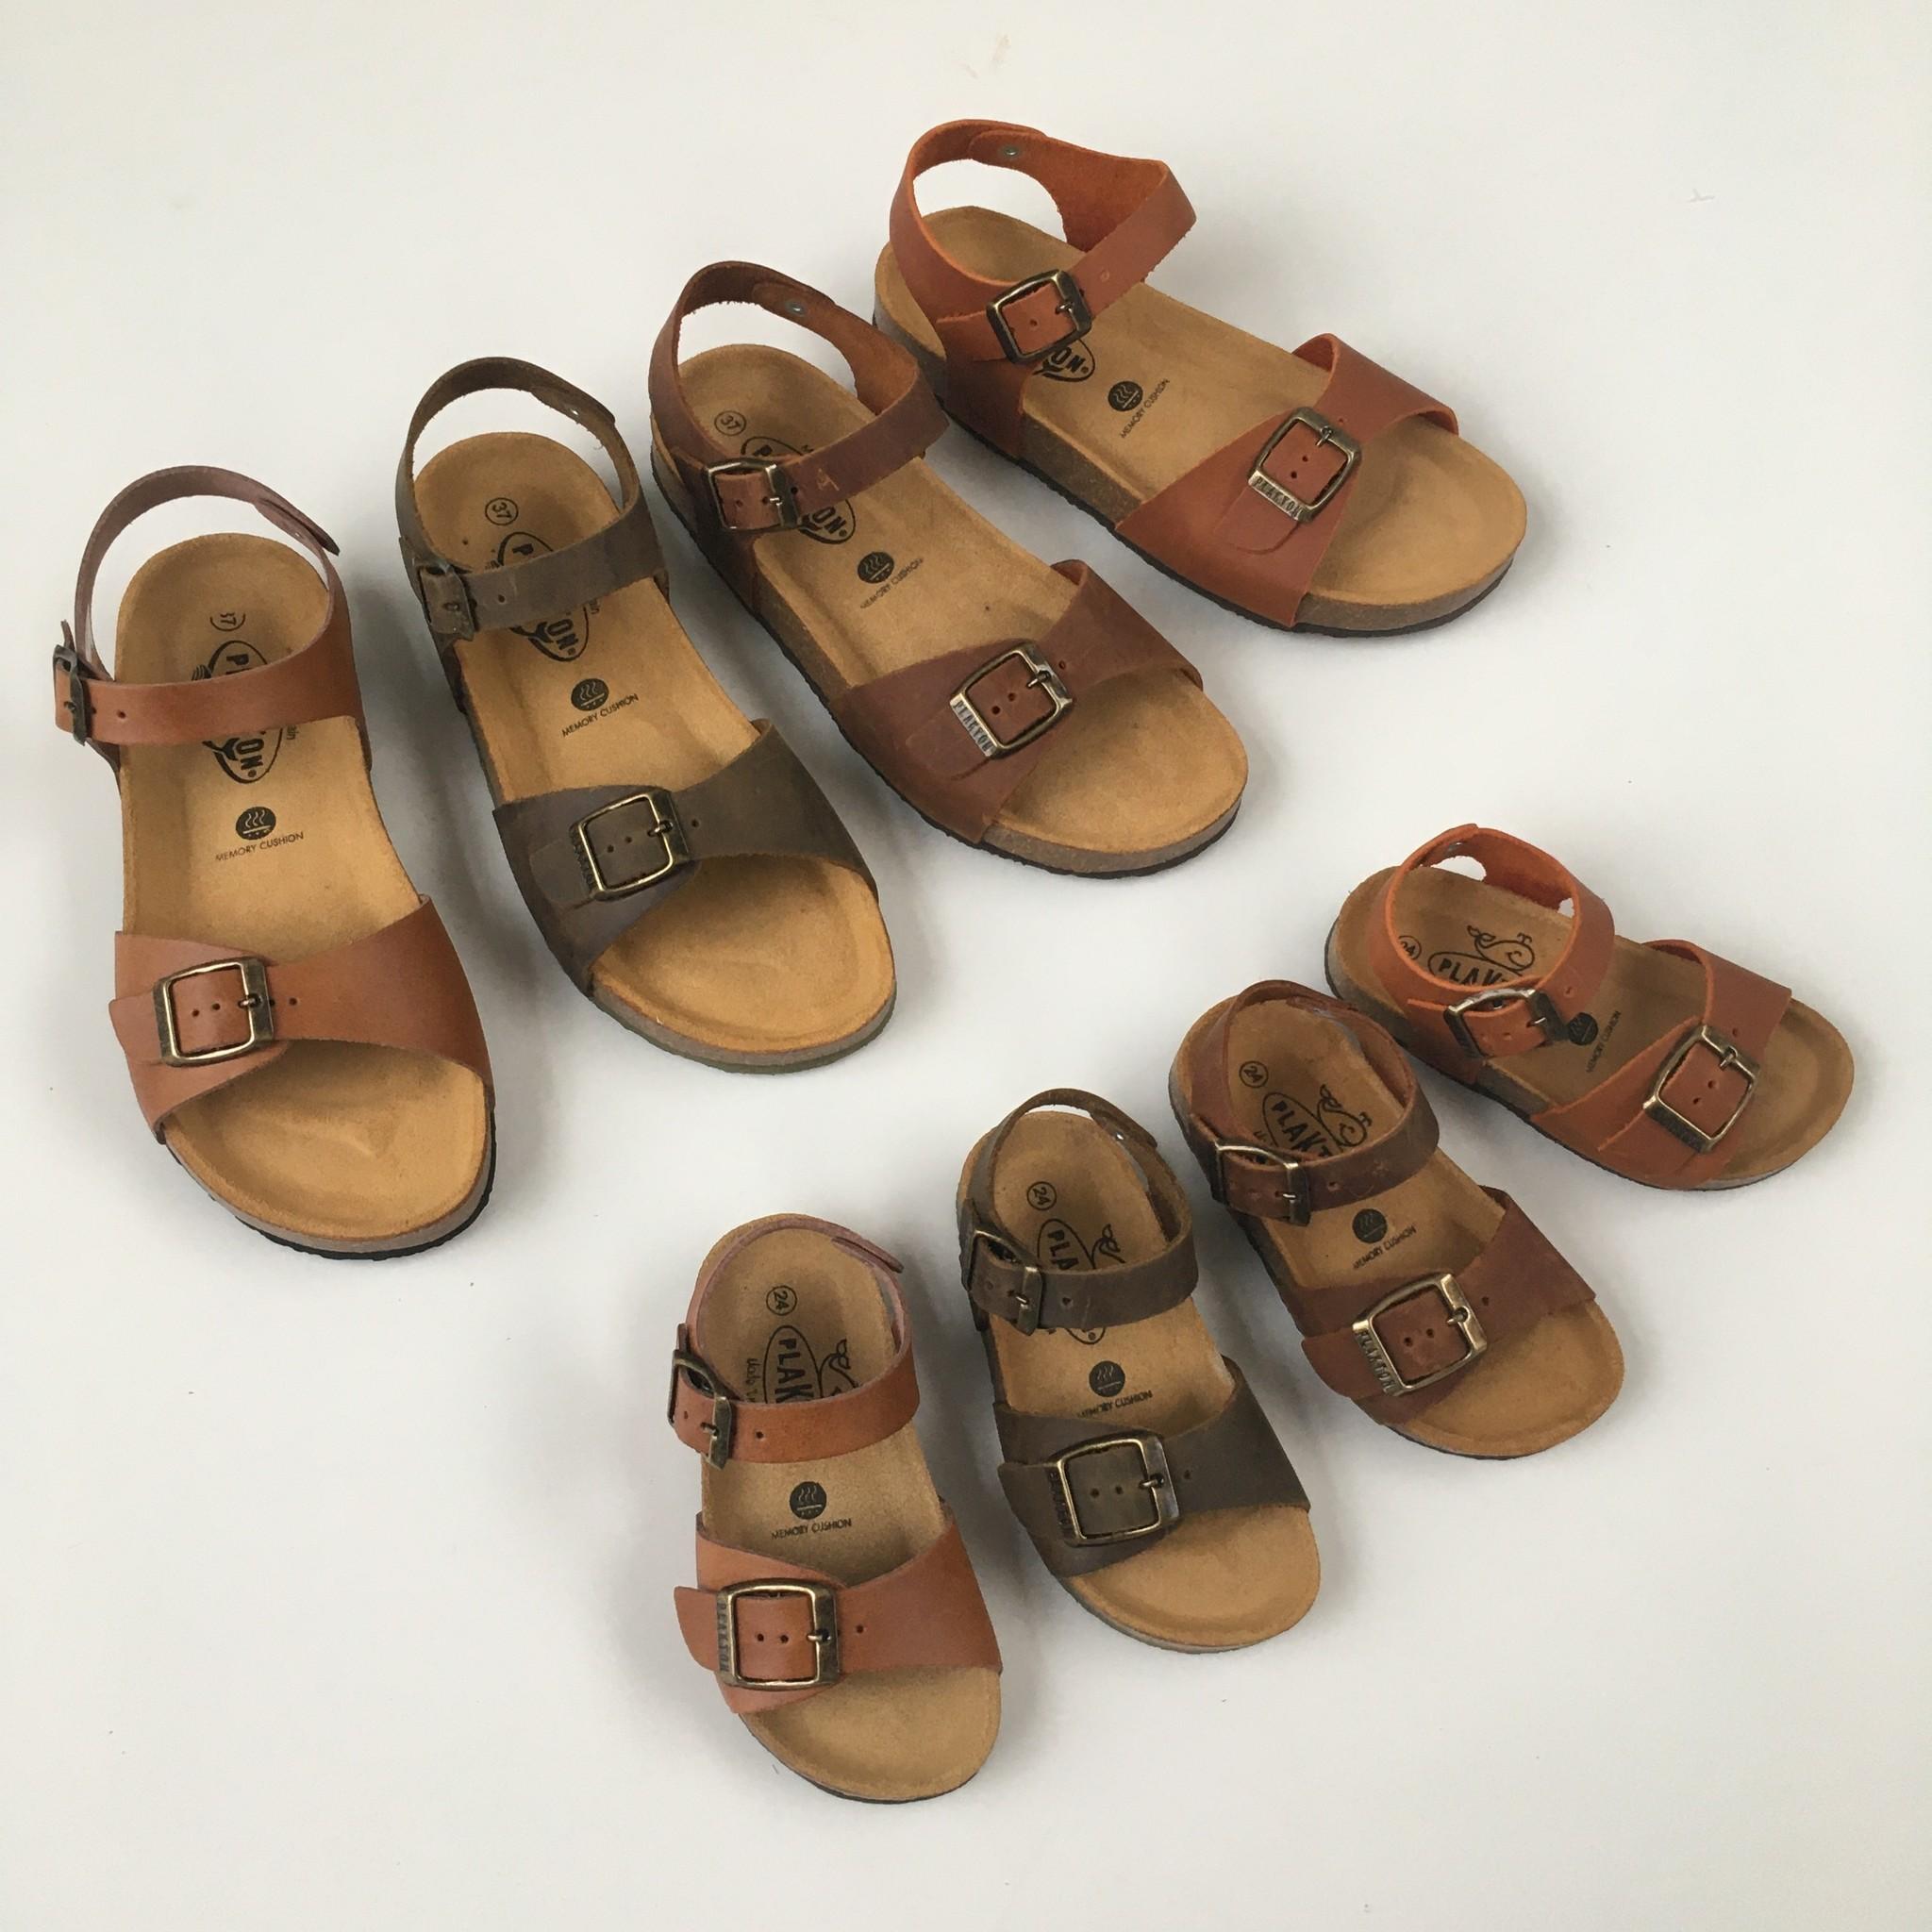 PLAKTON SANDALS leather cork sandal LOUIS teens & ladies - smooth leather cognac brown - 35 to 40